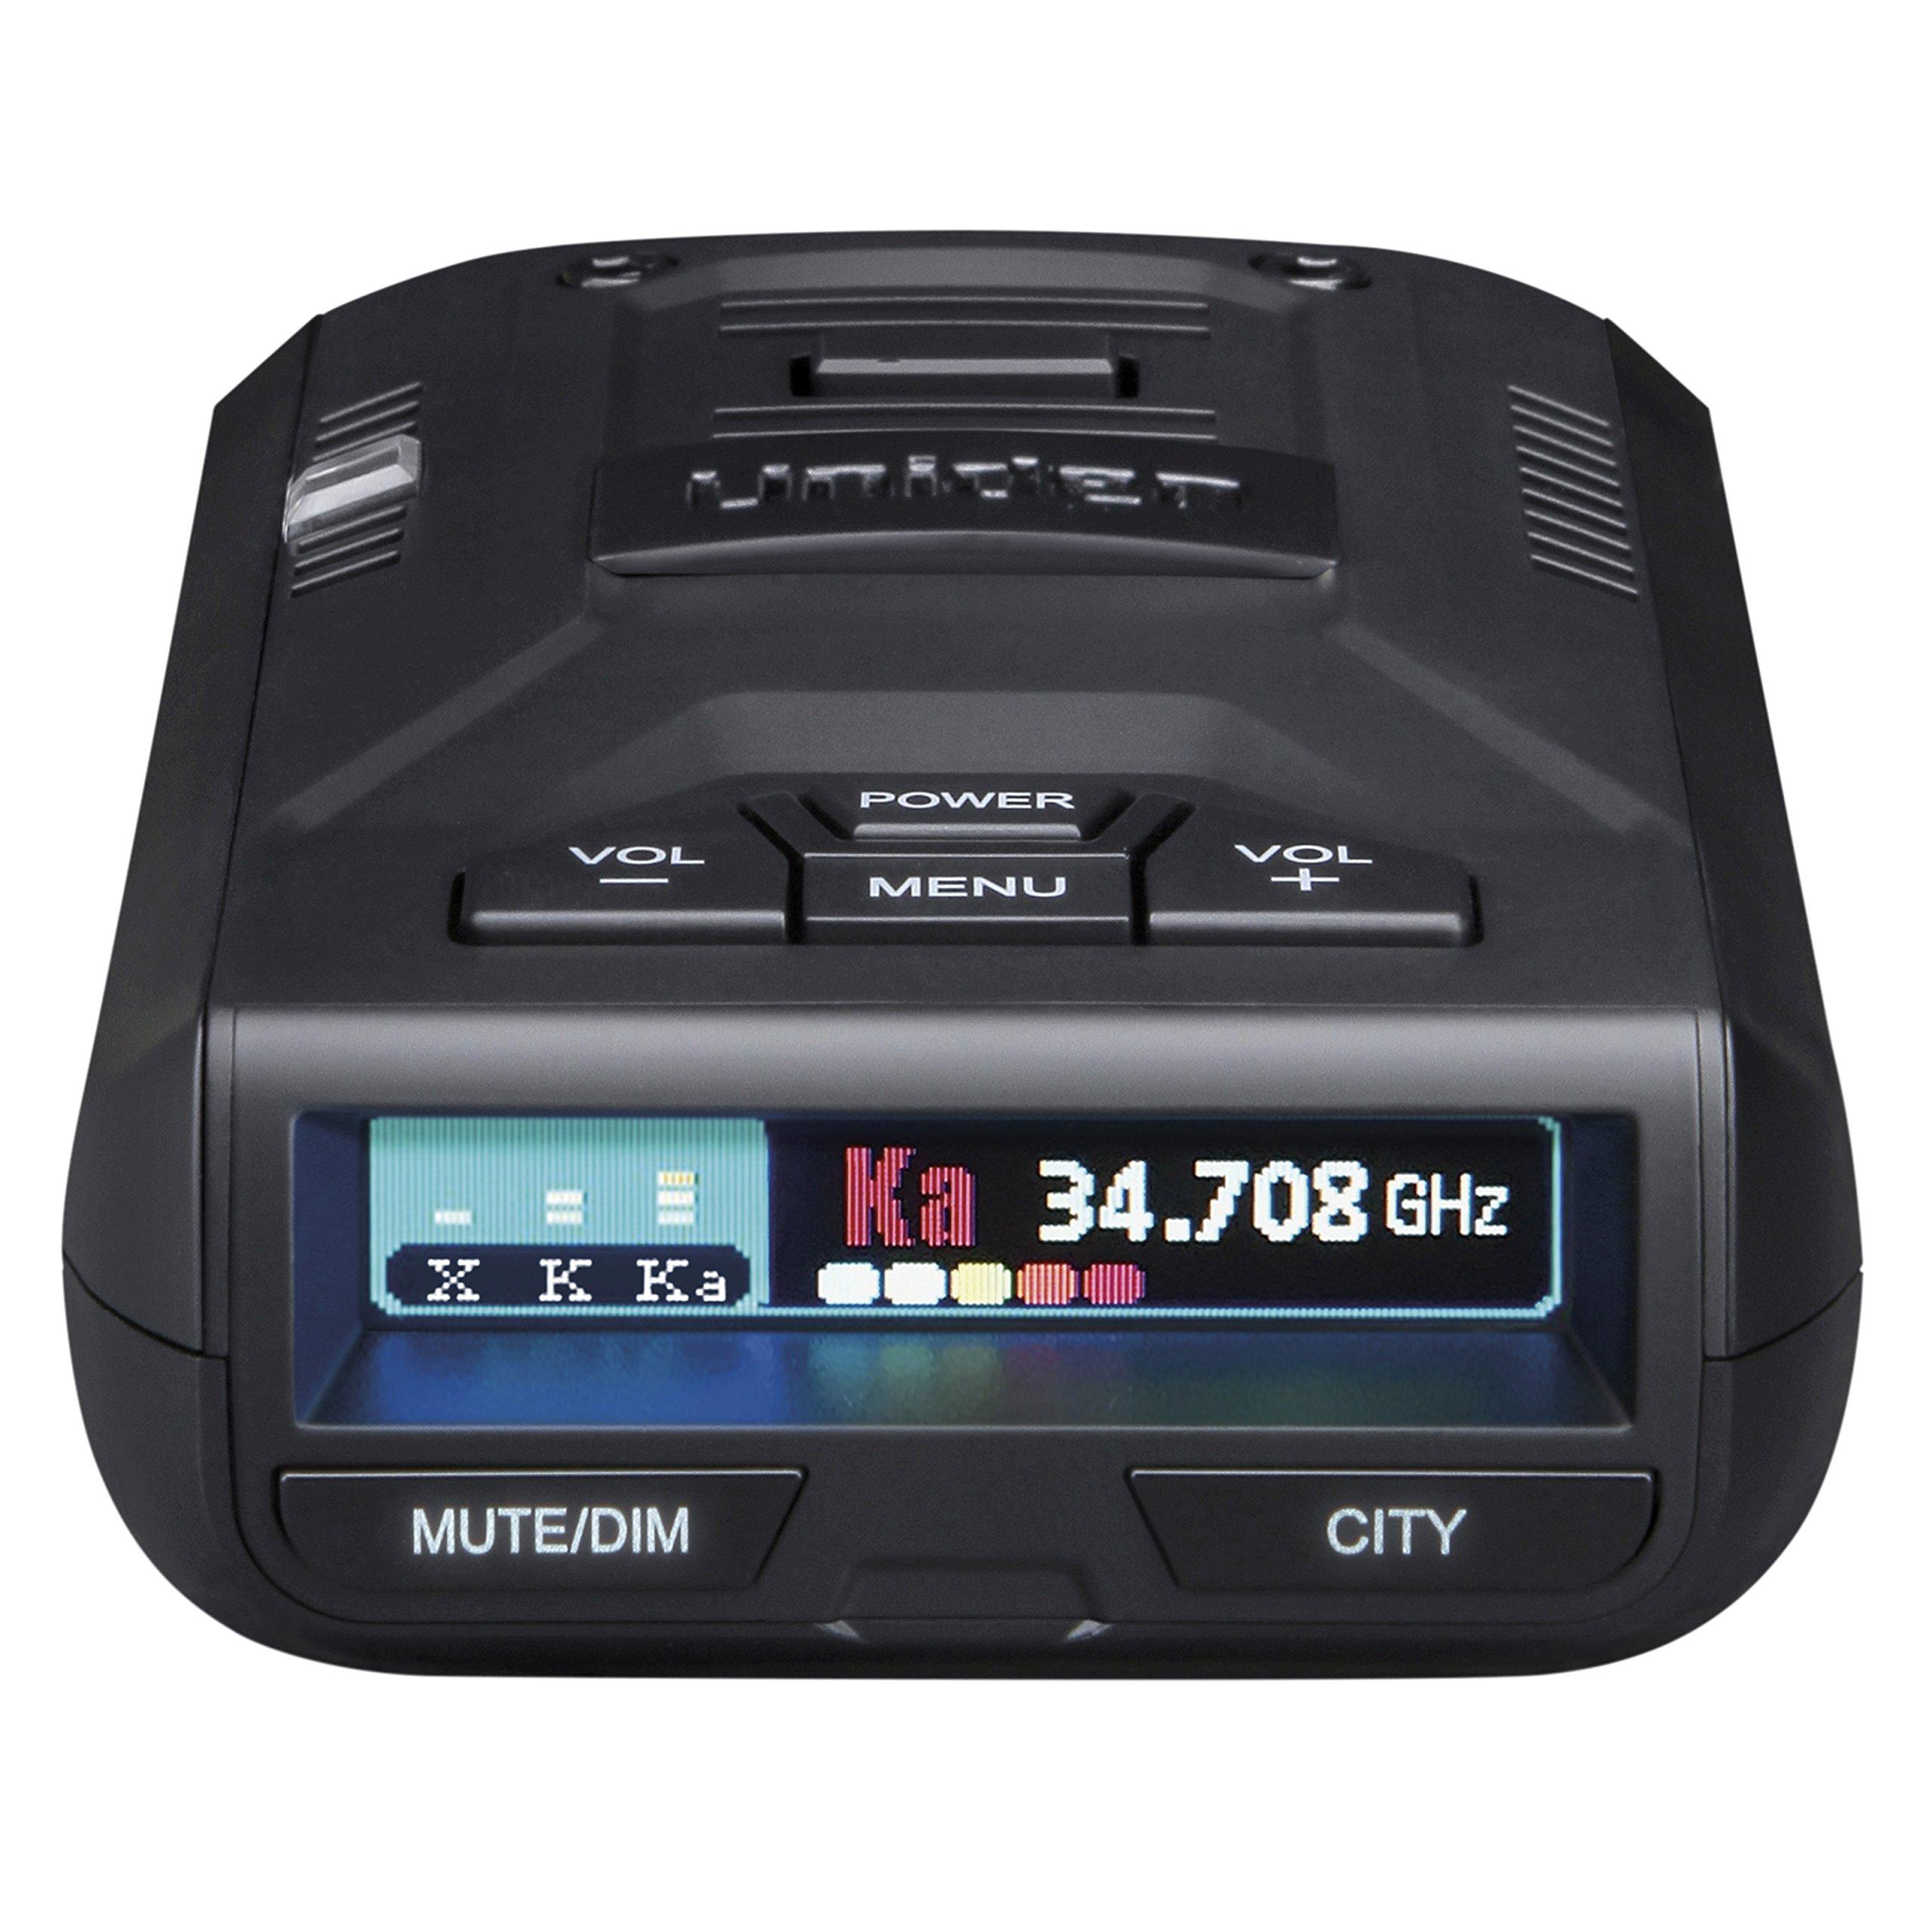 Uniden Uniden R1 Extreme Long Range Radar Laser Detector 360 Degree Dsp Voice Alert, 1.1 Lb